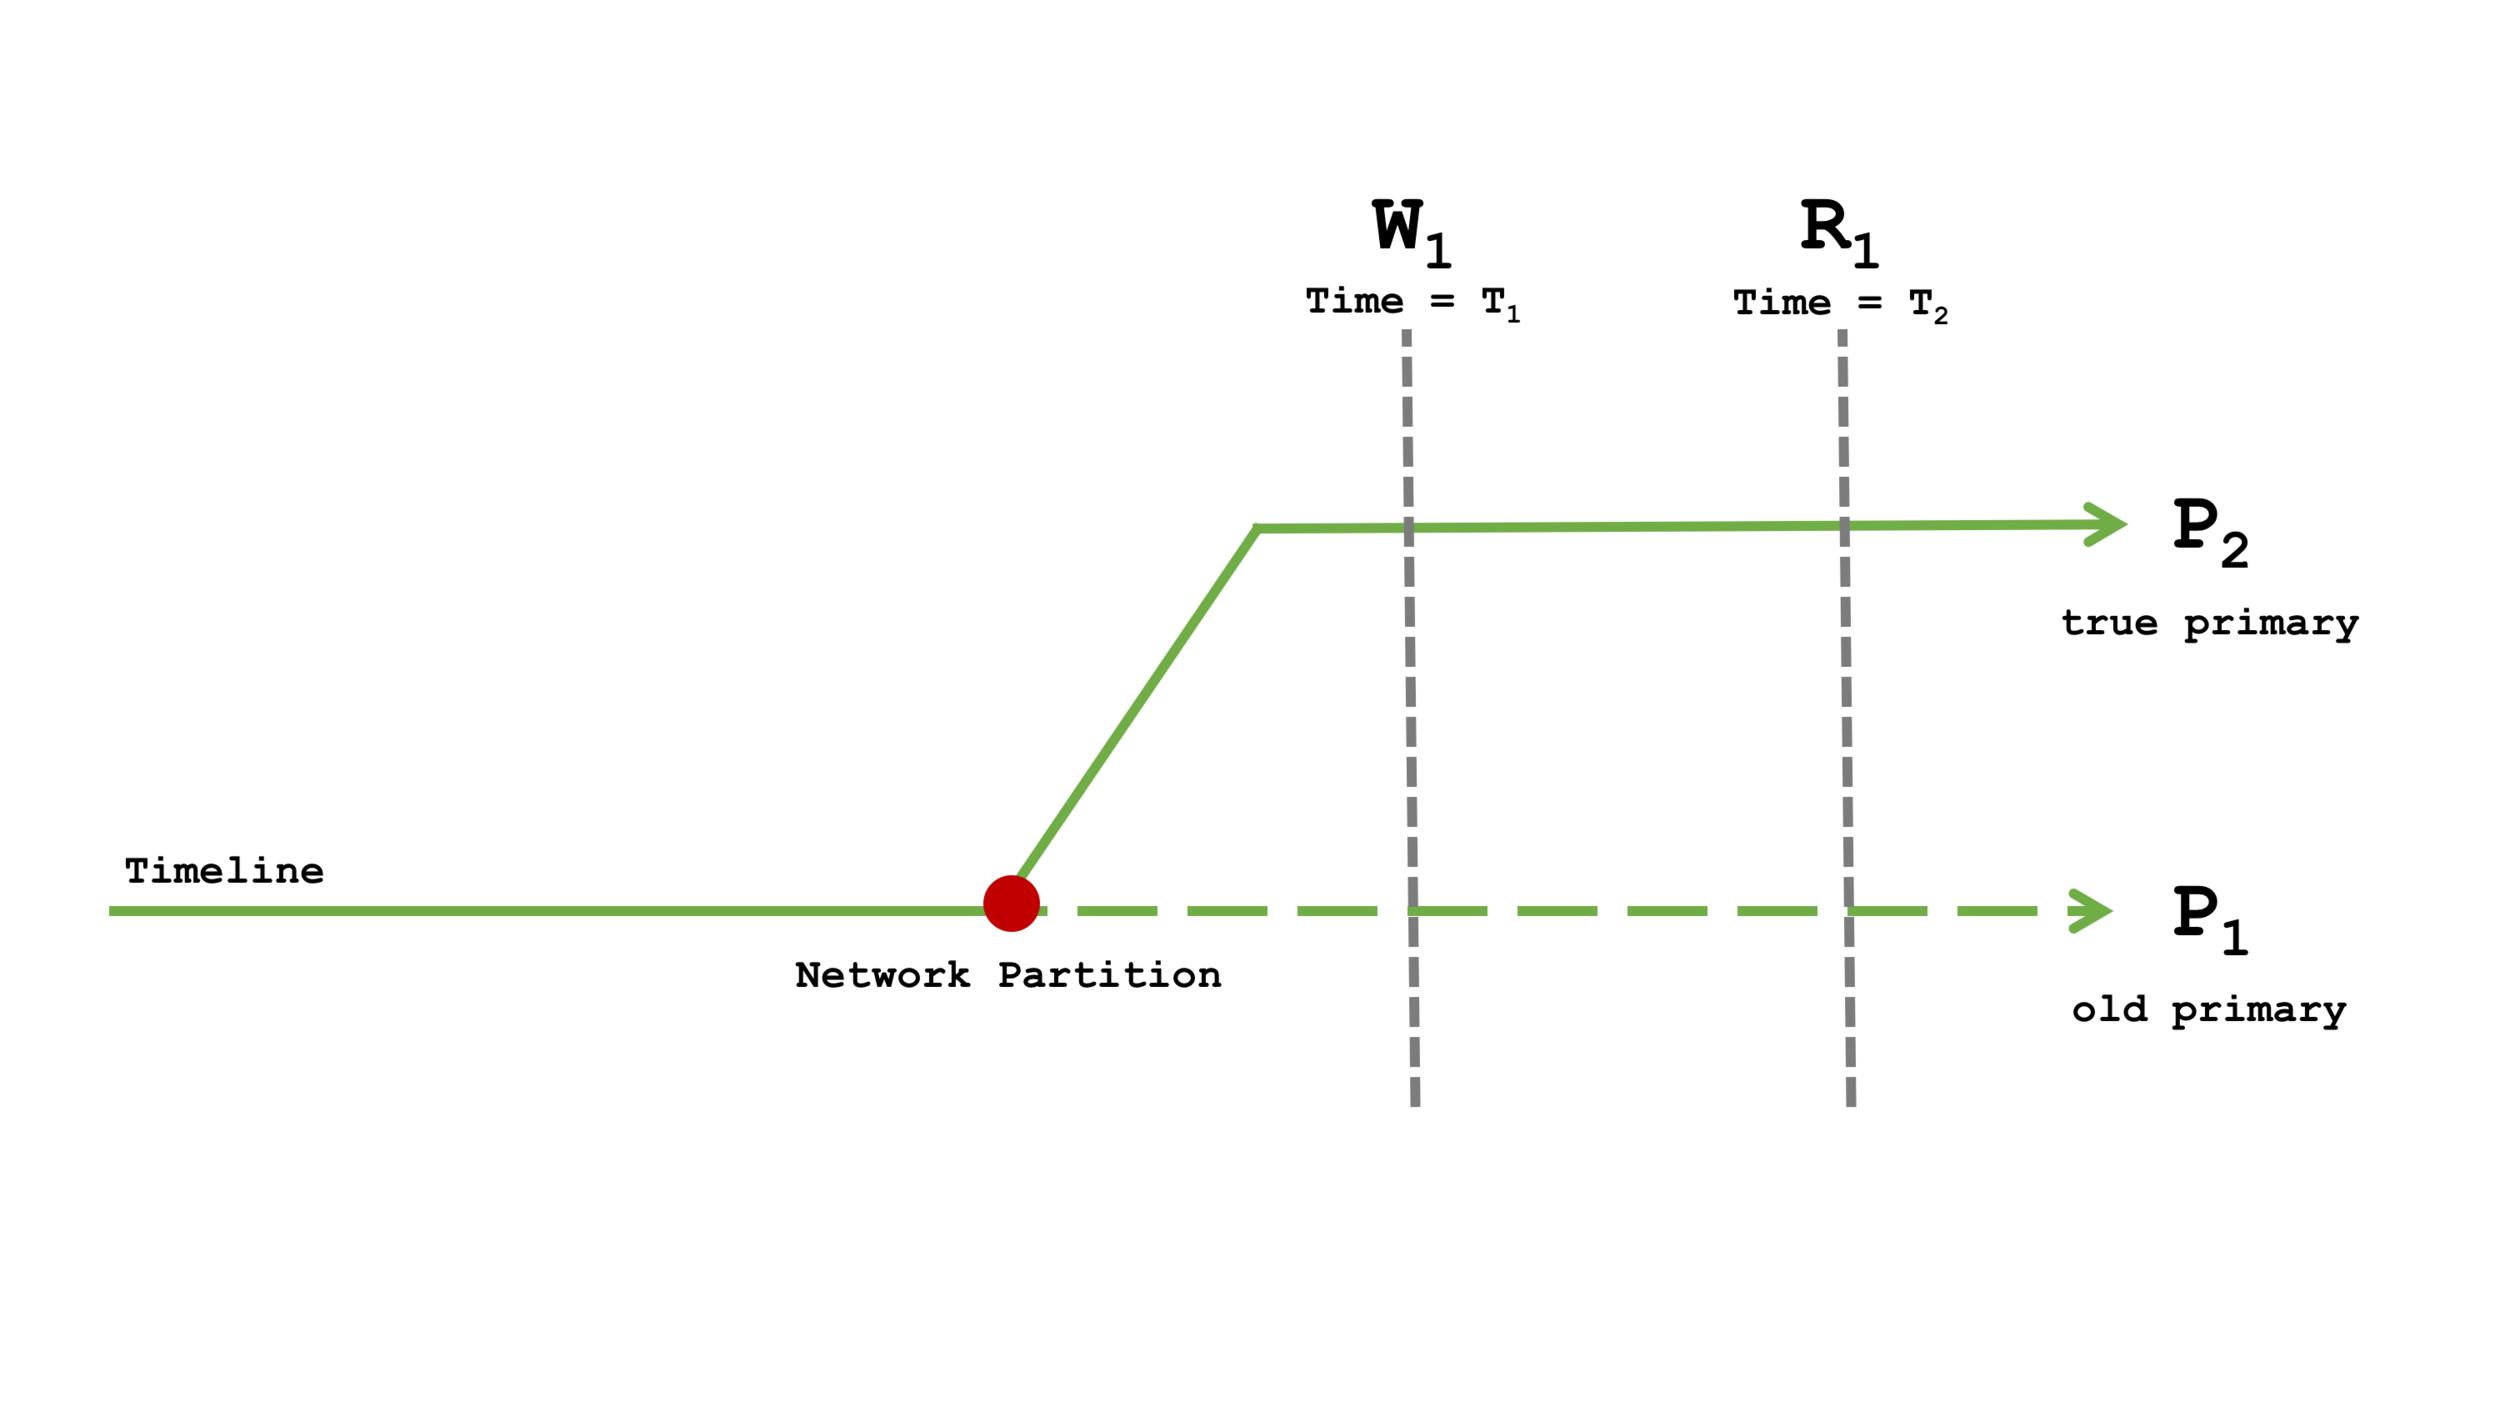 Diagram 3: Network Partition Timeline